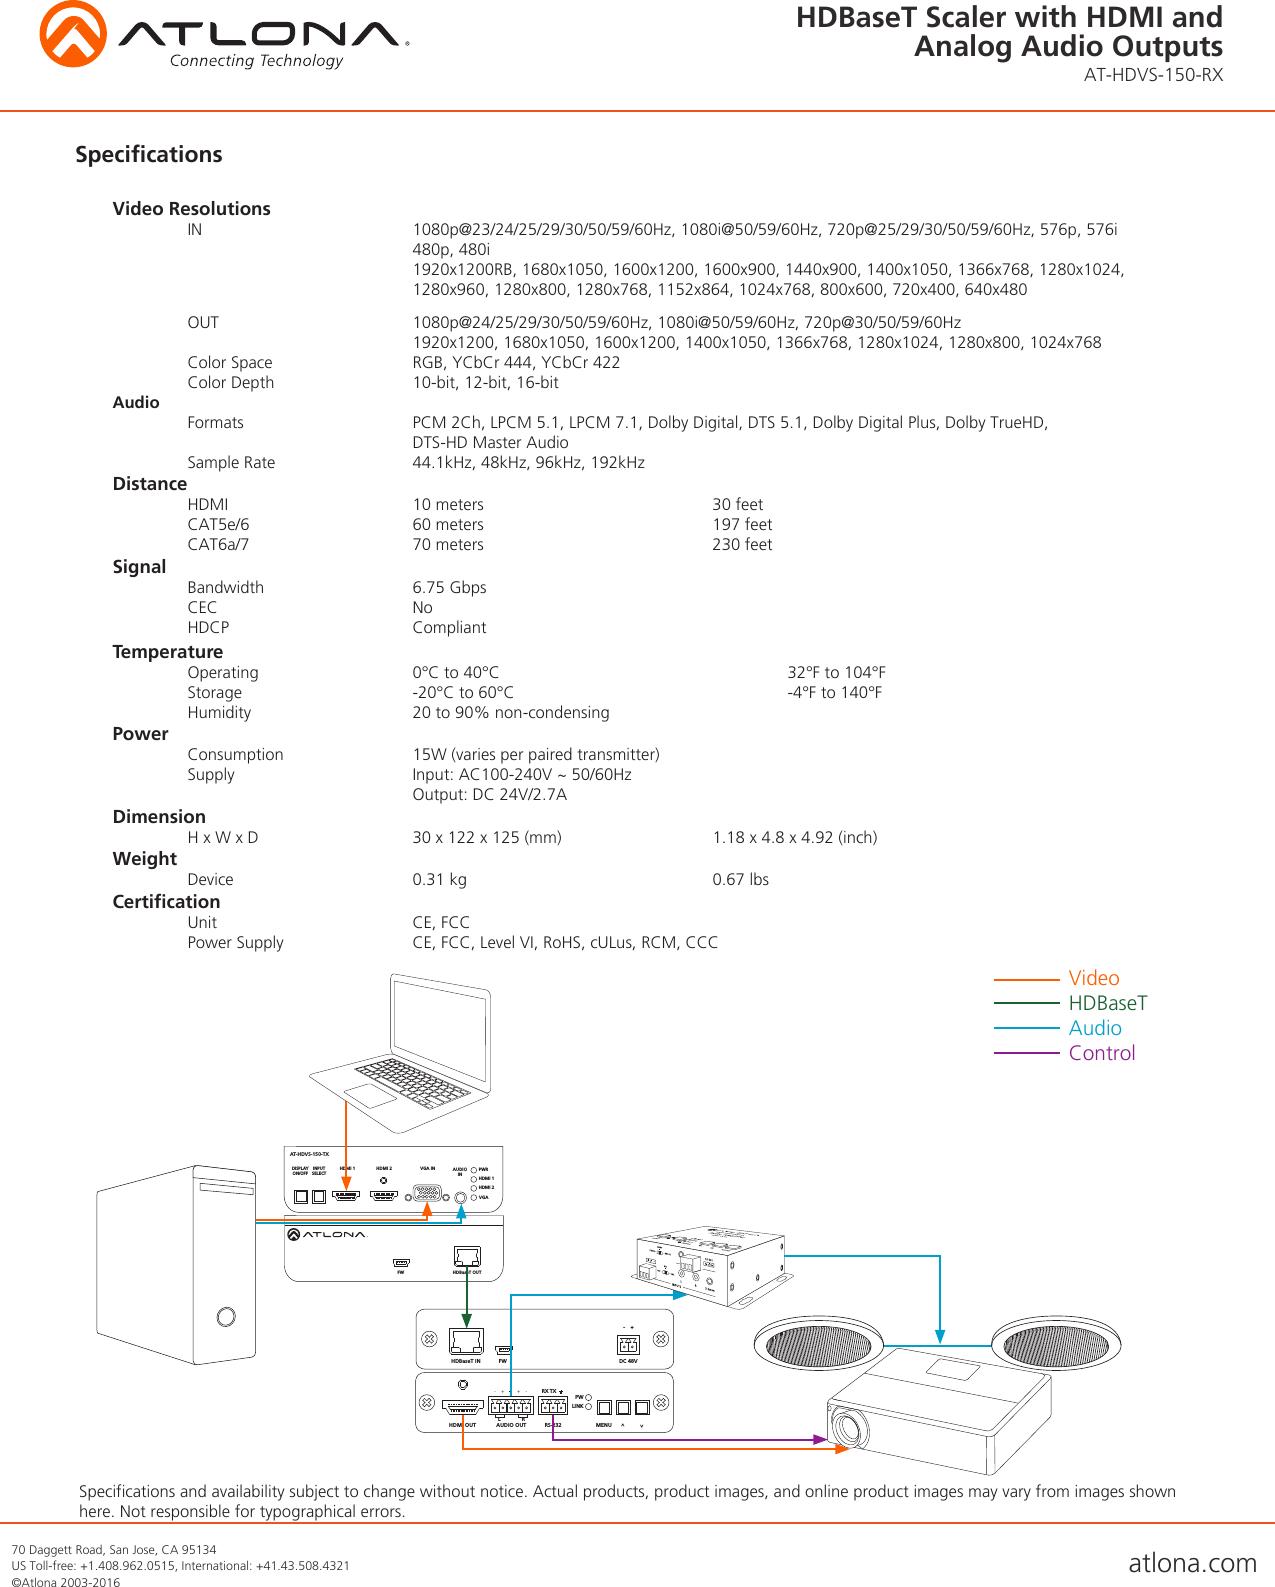 Atl Hdvs 150 Rx User Manual